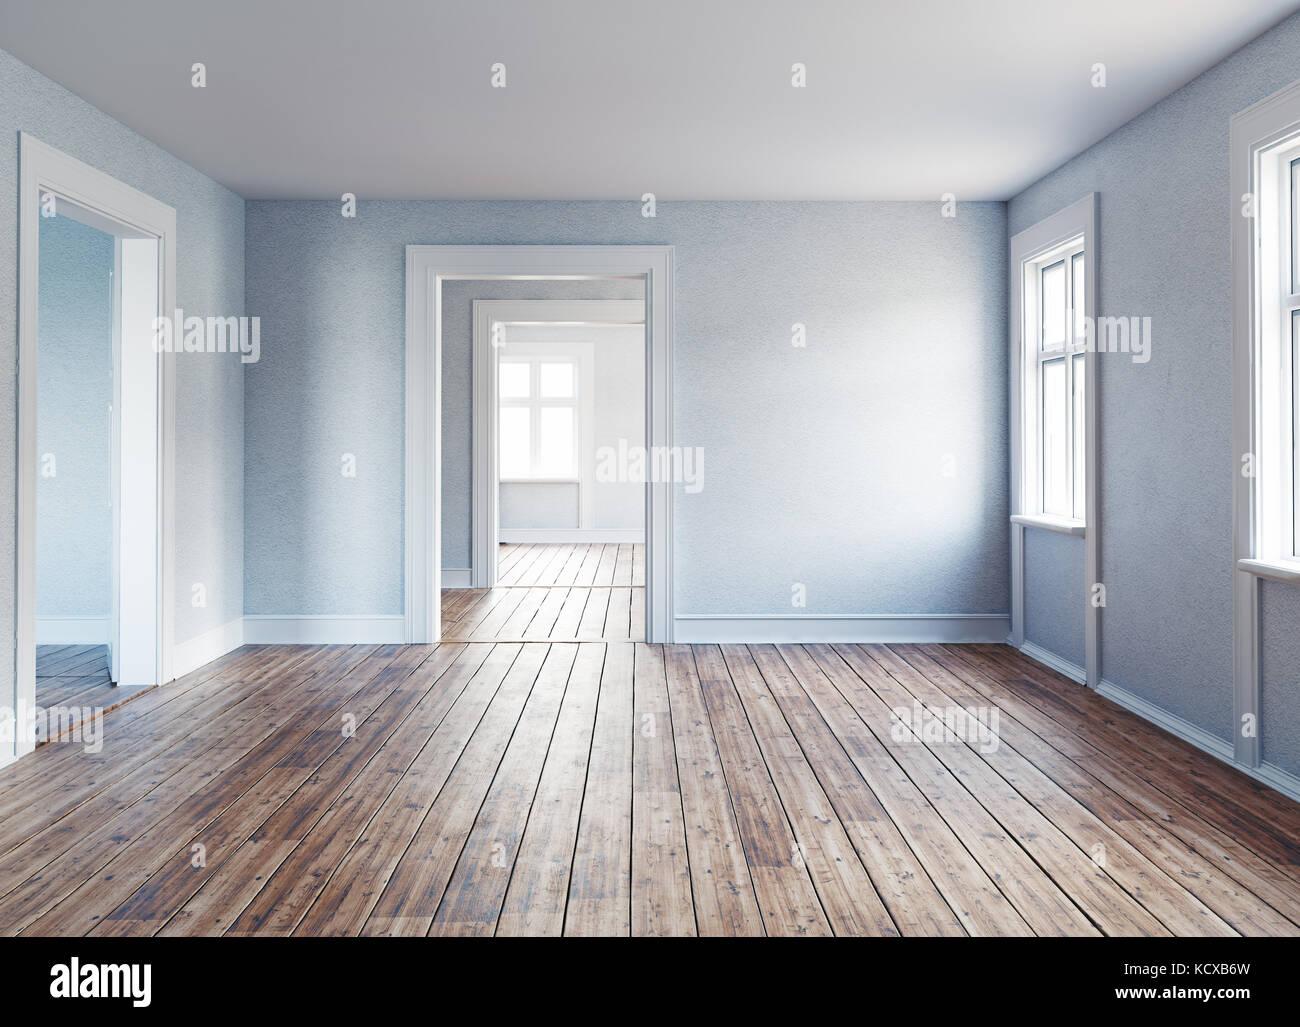 Empty White Background Living Room Stock Photos & Empty White ...